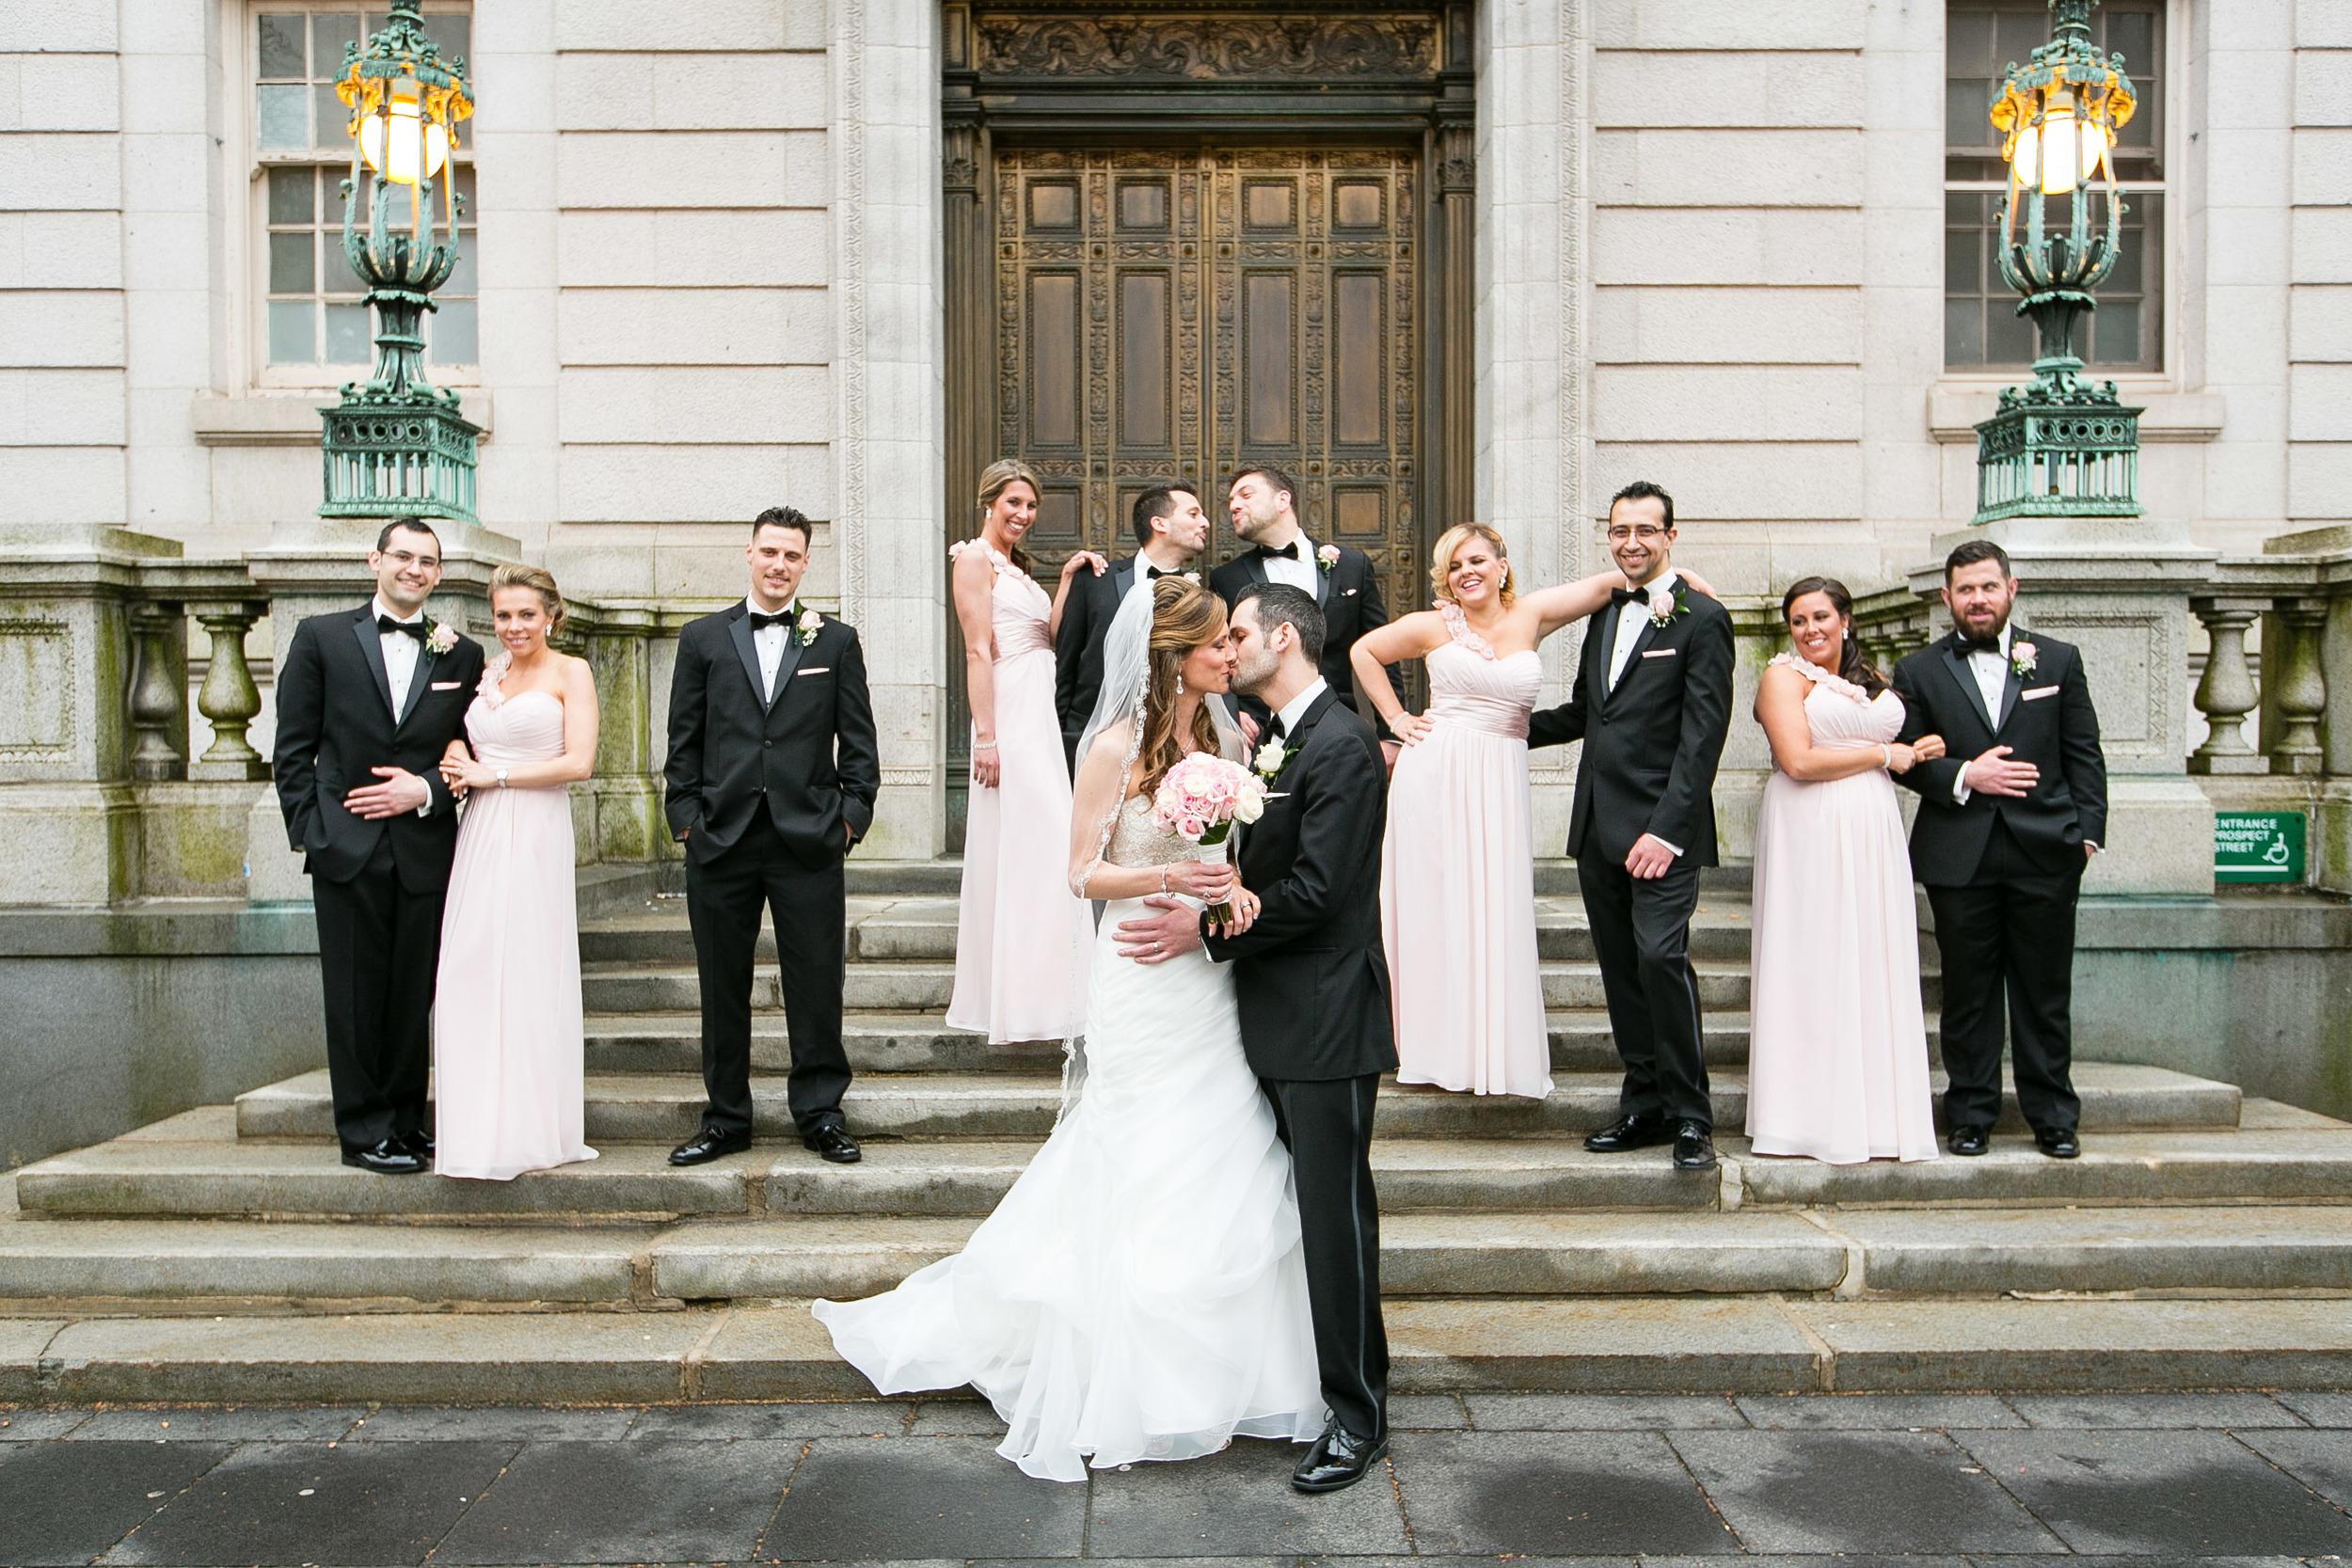 Polish-Portuguese-Elegant-Wedding-Riverview-Simsbury-Connecticut-Jacek-Dolata-Photography-9.jpg